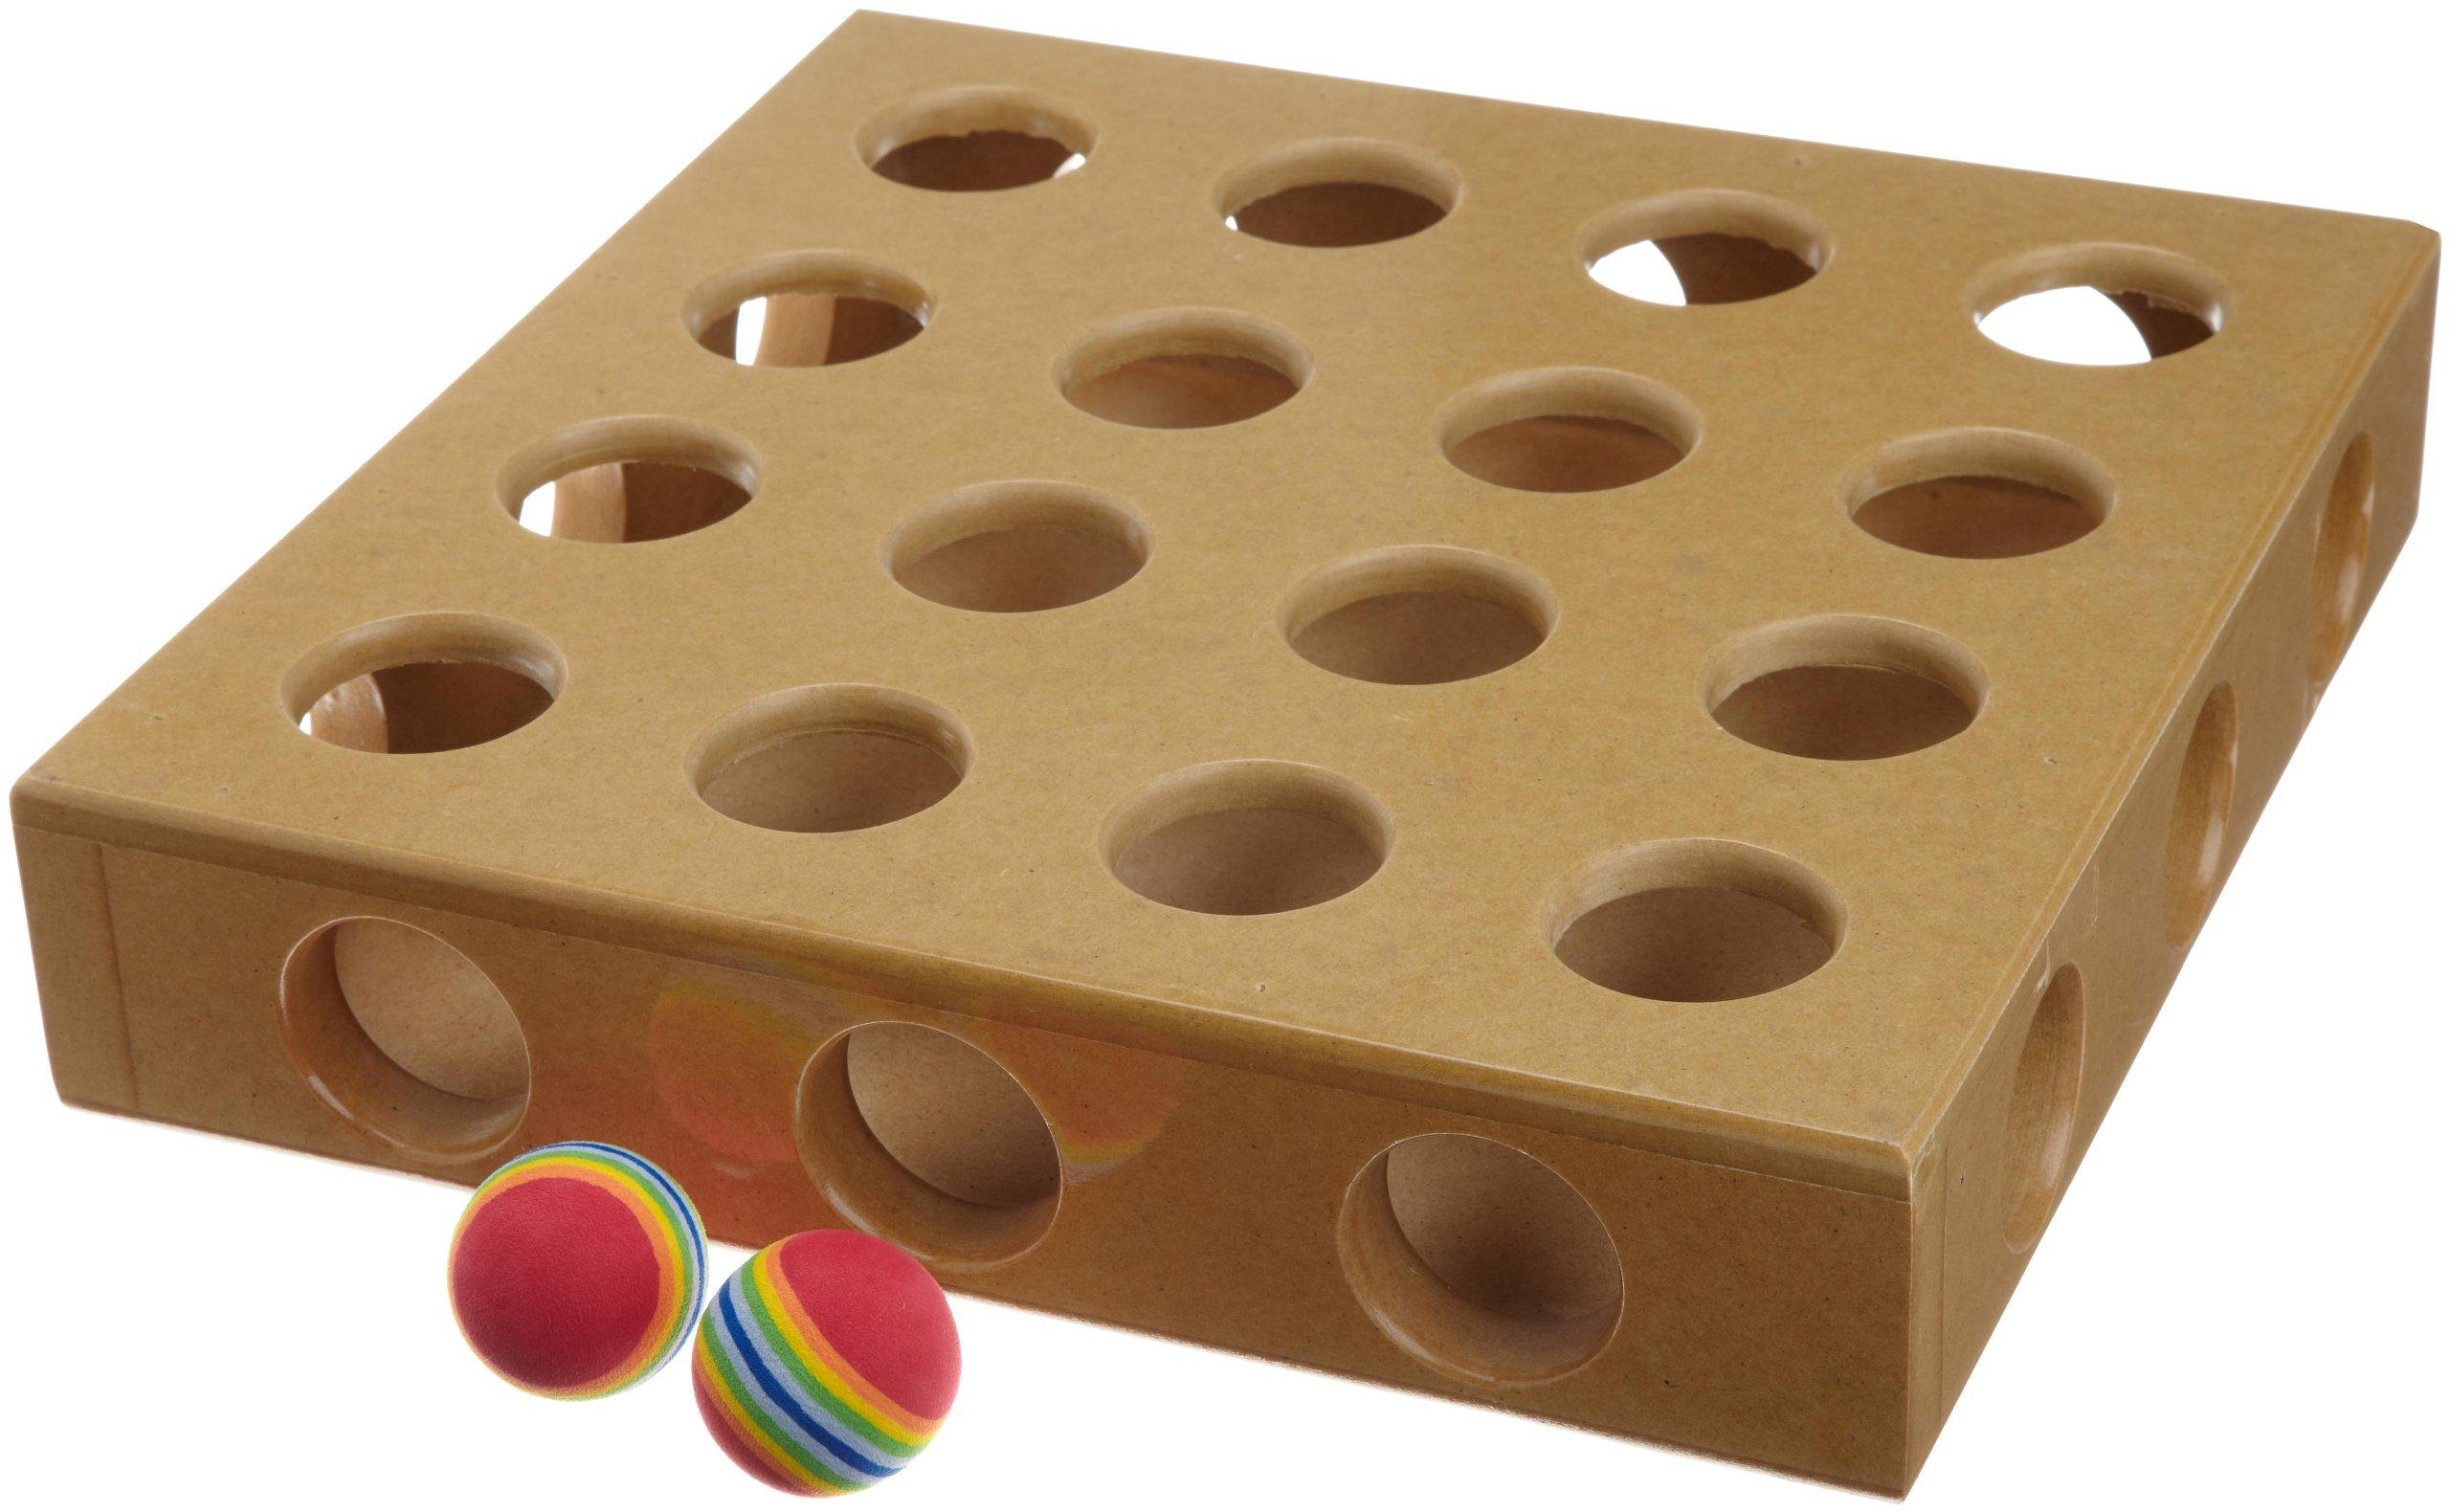 SmartCat 3833 Peek-a-Prize Pet Toy Box by SmartCat